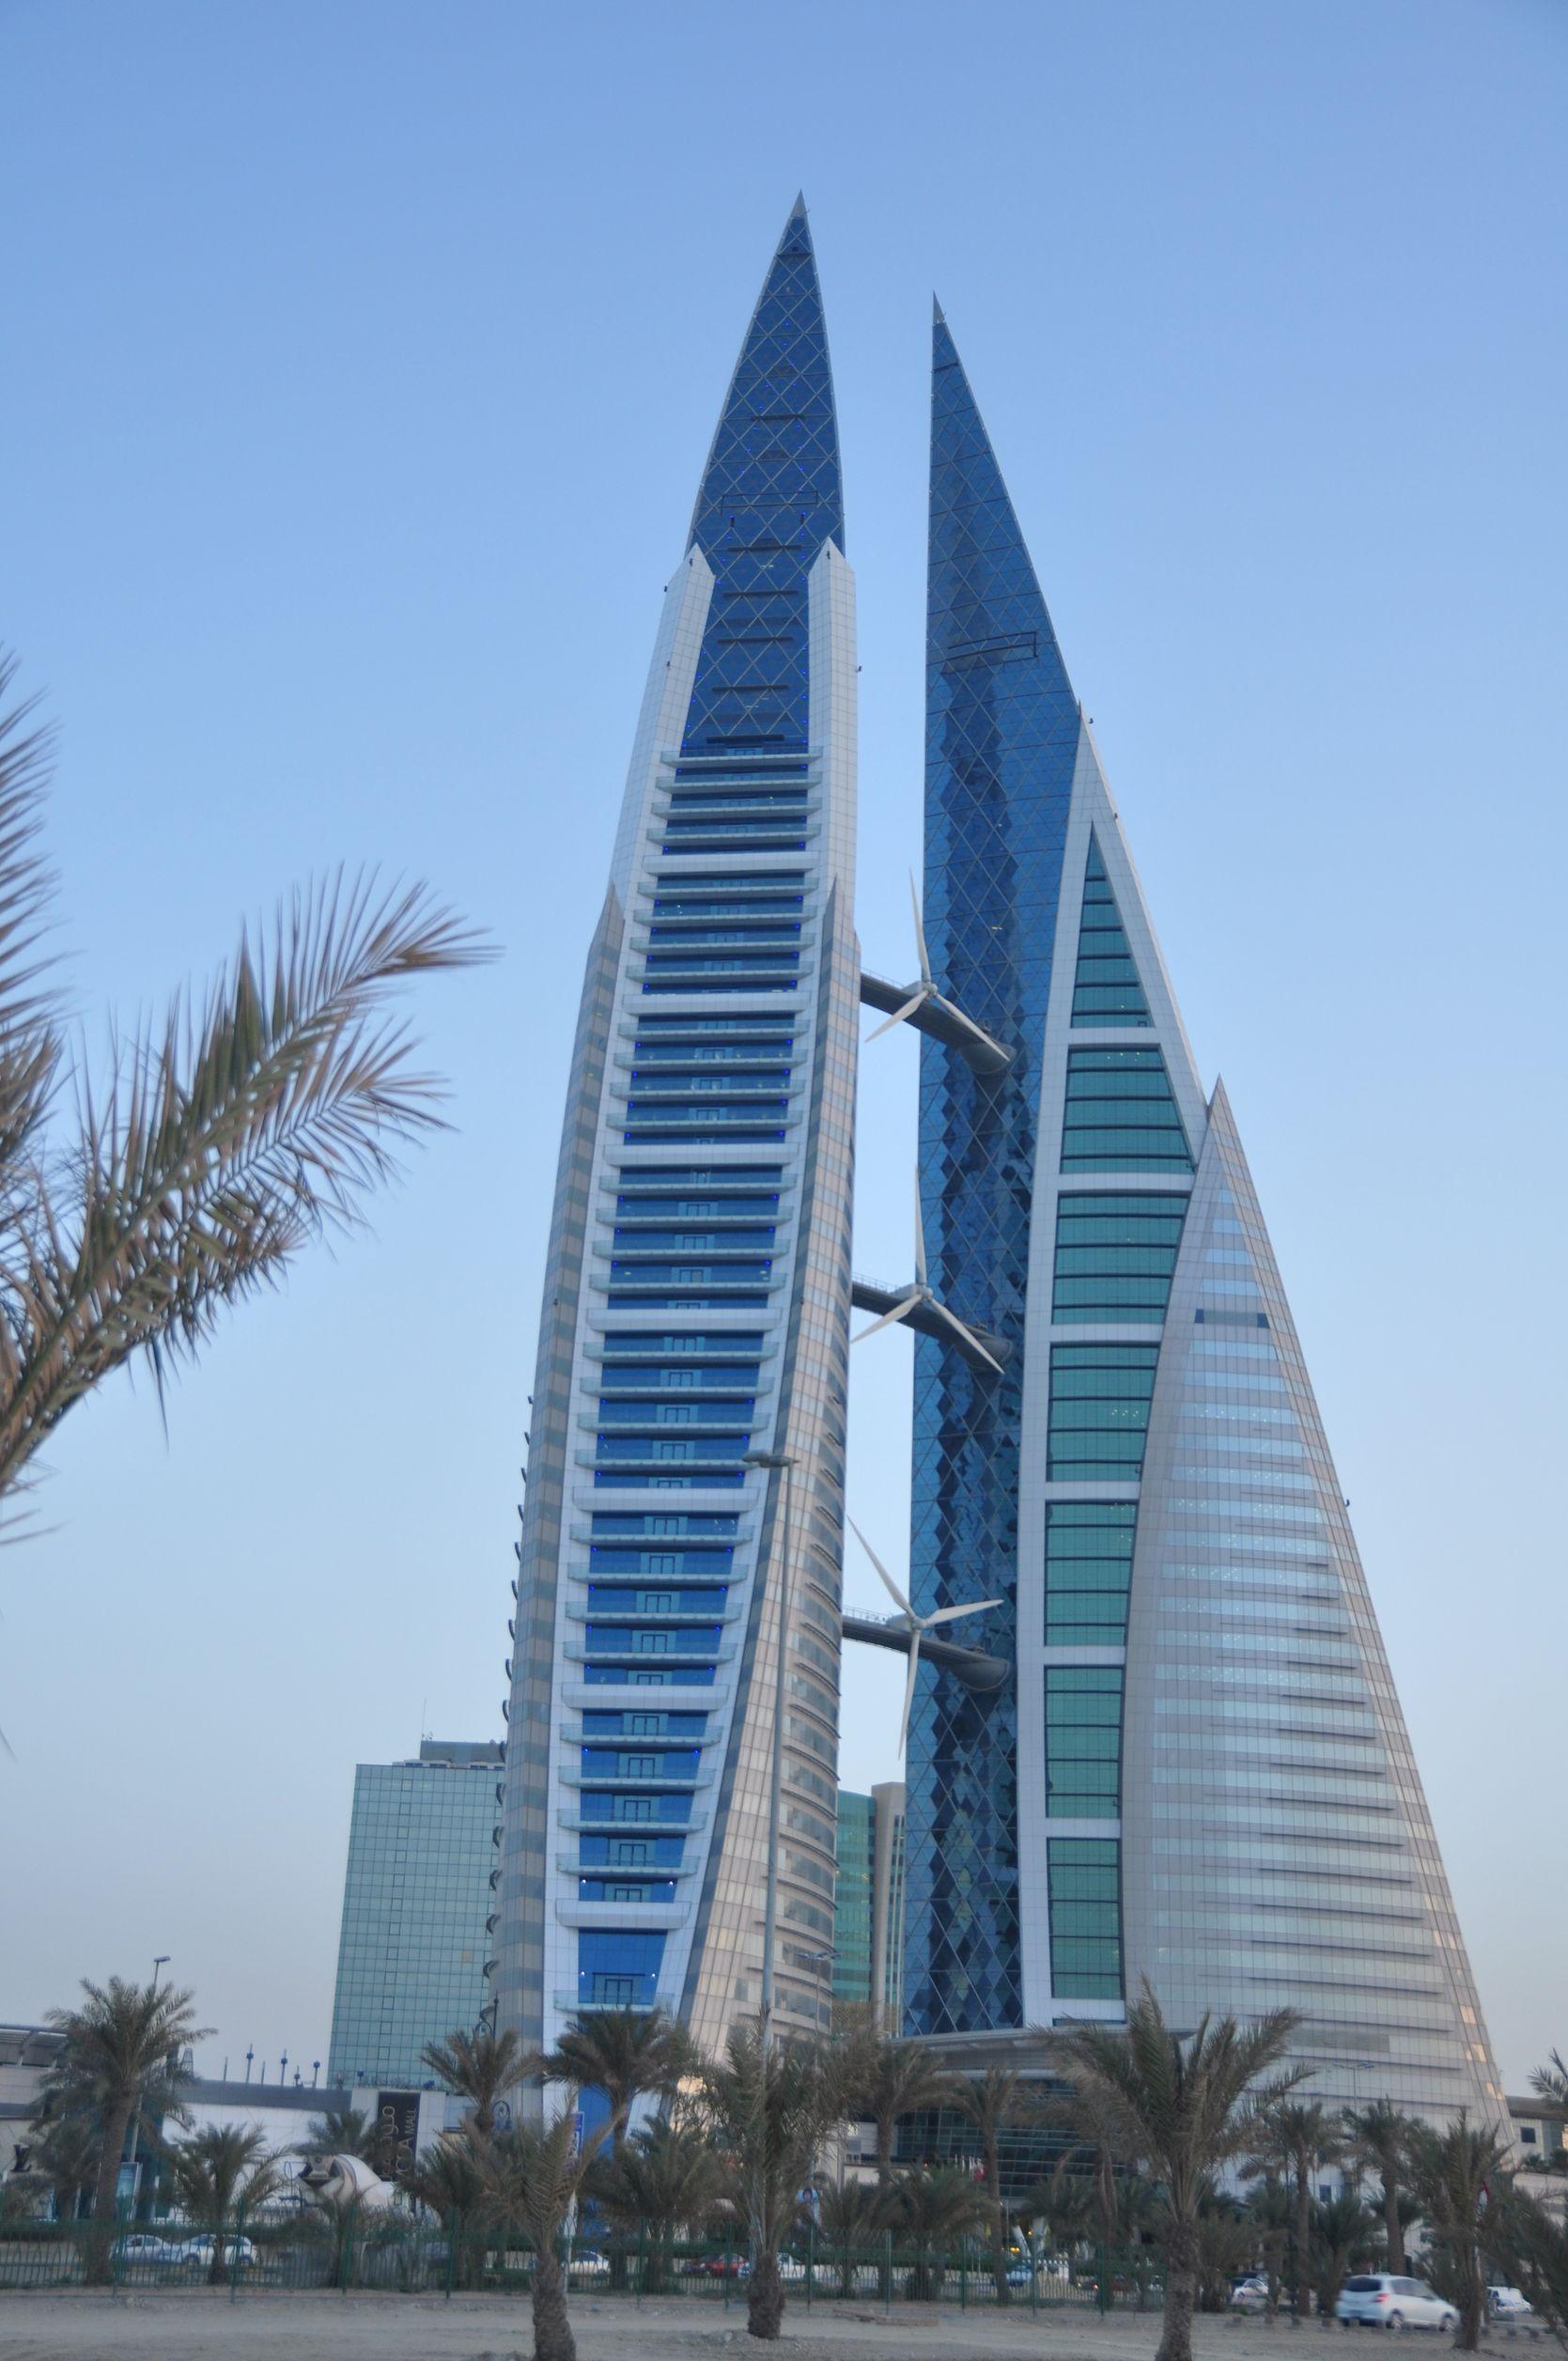 Bahrain skyscraper great building structure pinterest for Architecture companies qatar